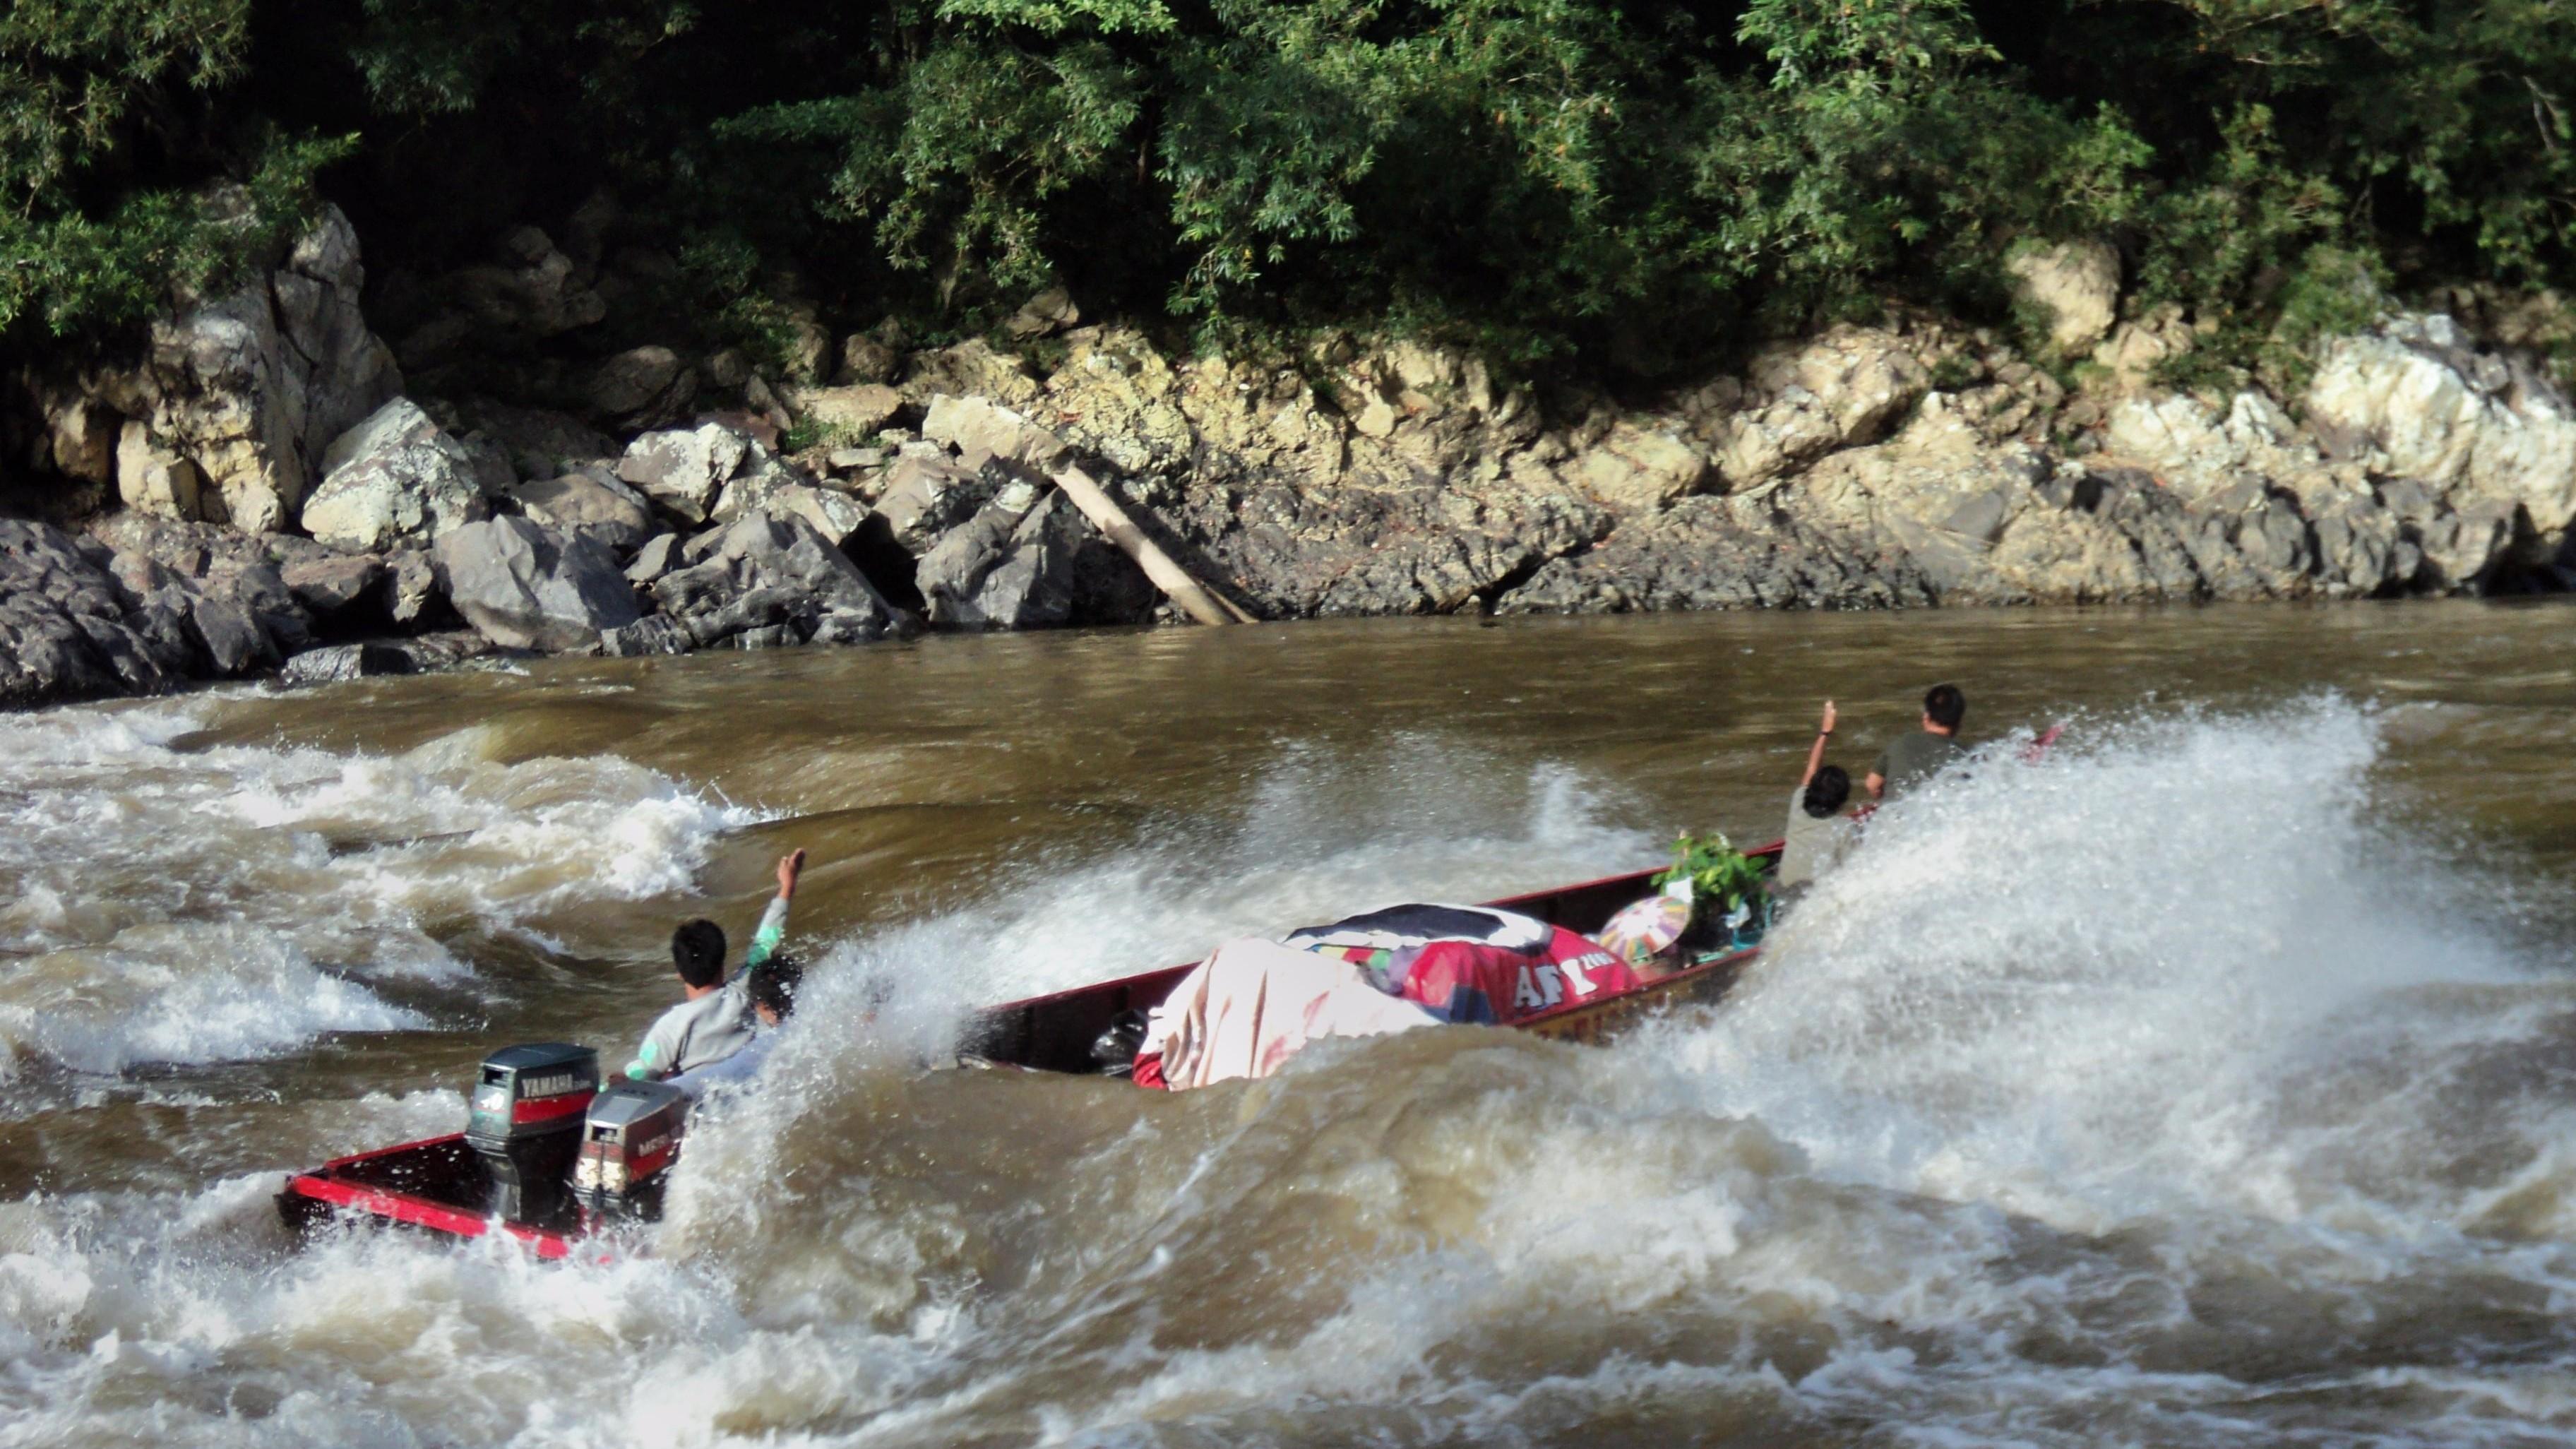 kayan river adventure jungle trek borneo indonesia kalimantan guide tour trip kayan mentarang dayak